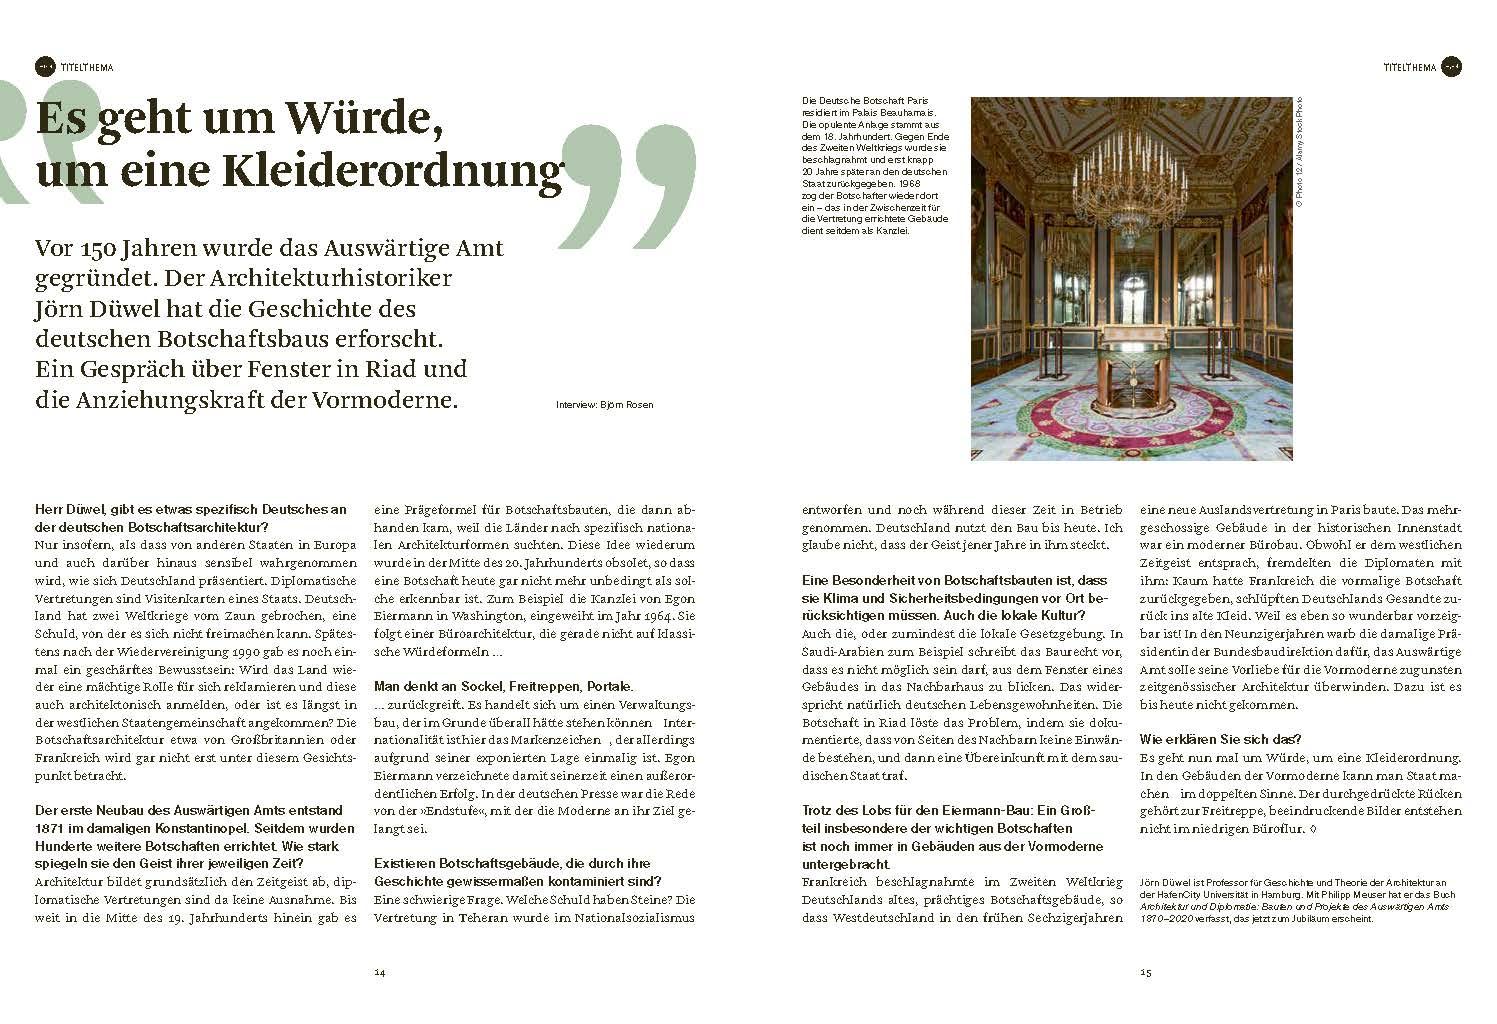 DOM magazine 01/2020, Seiten 14/15 (Bild: DOM publishers)